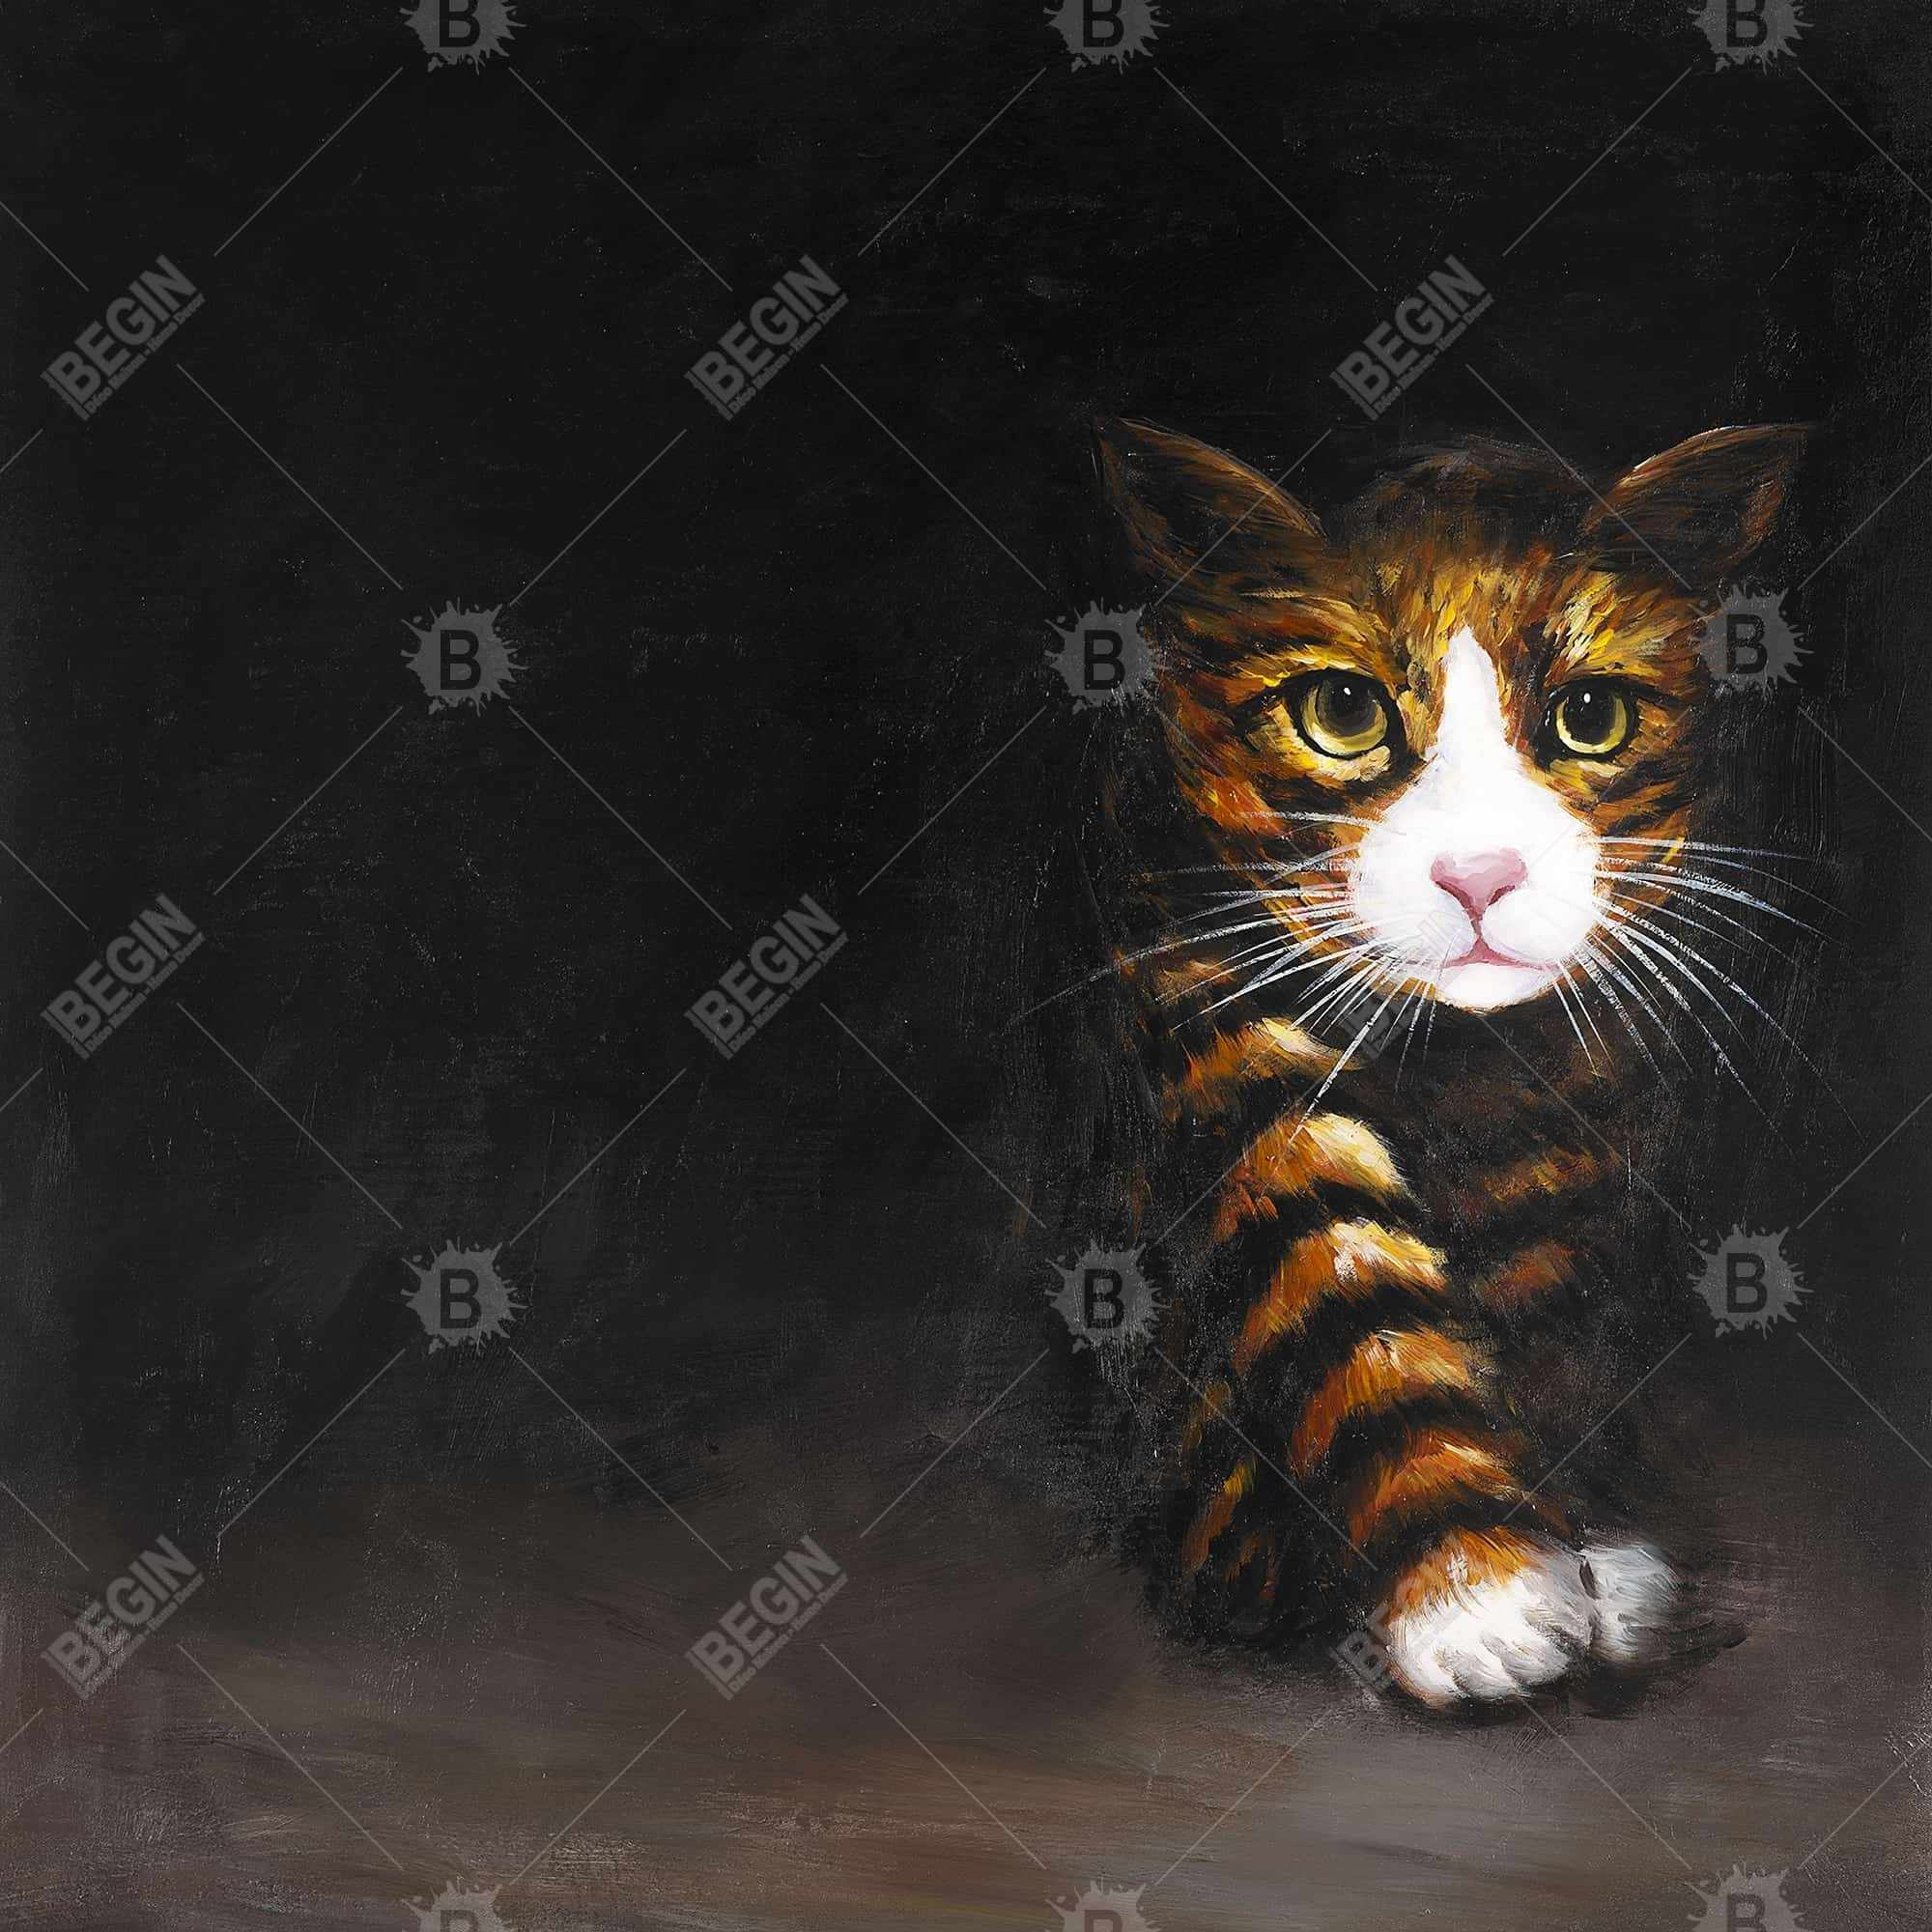 Discreet cat